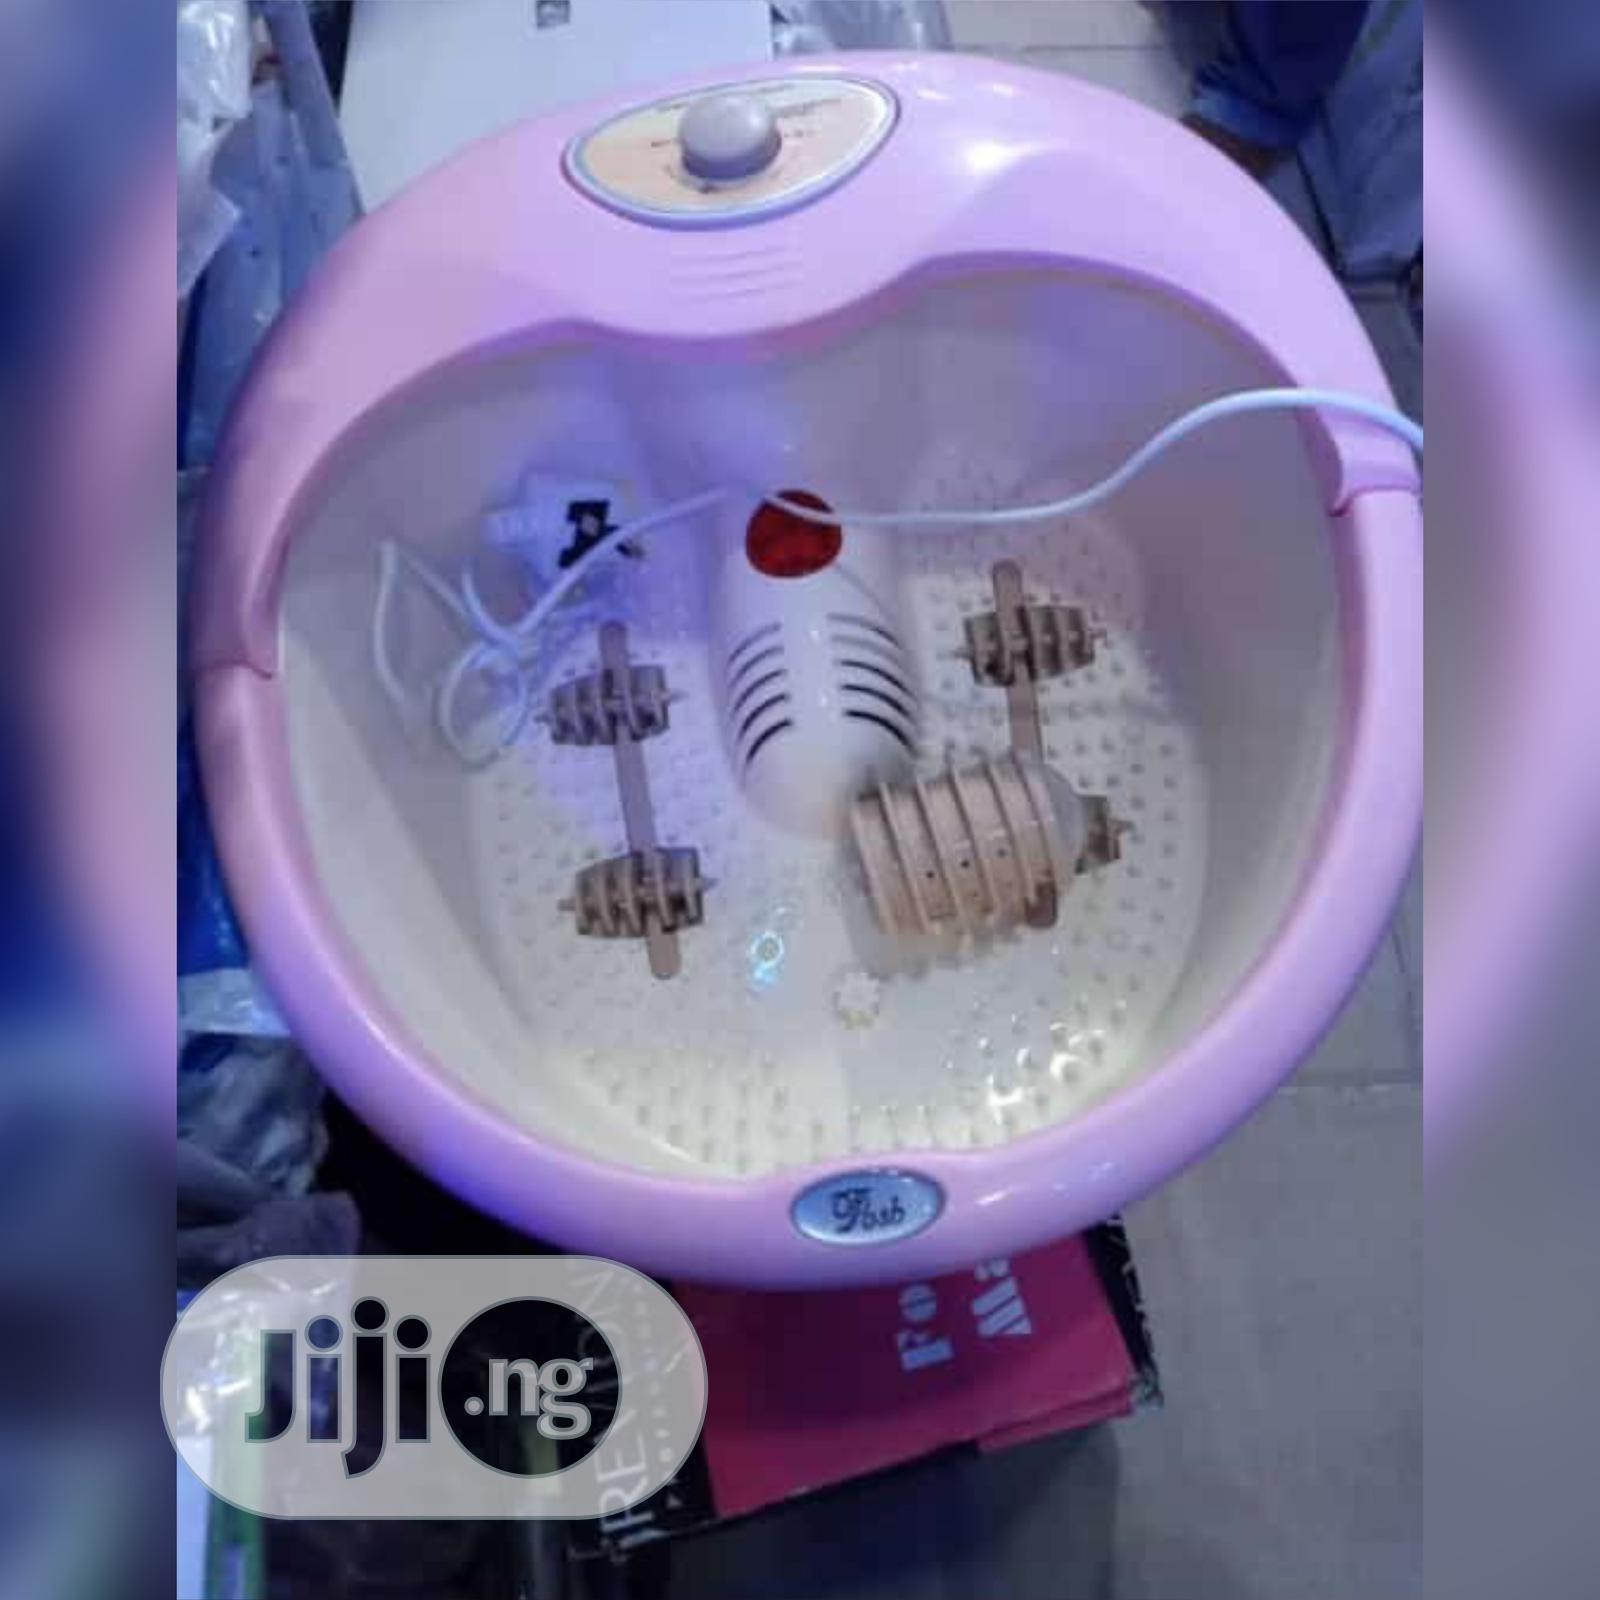 Digital Foot Massaging Tub